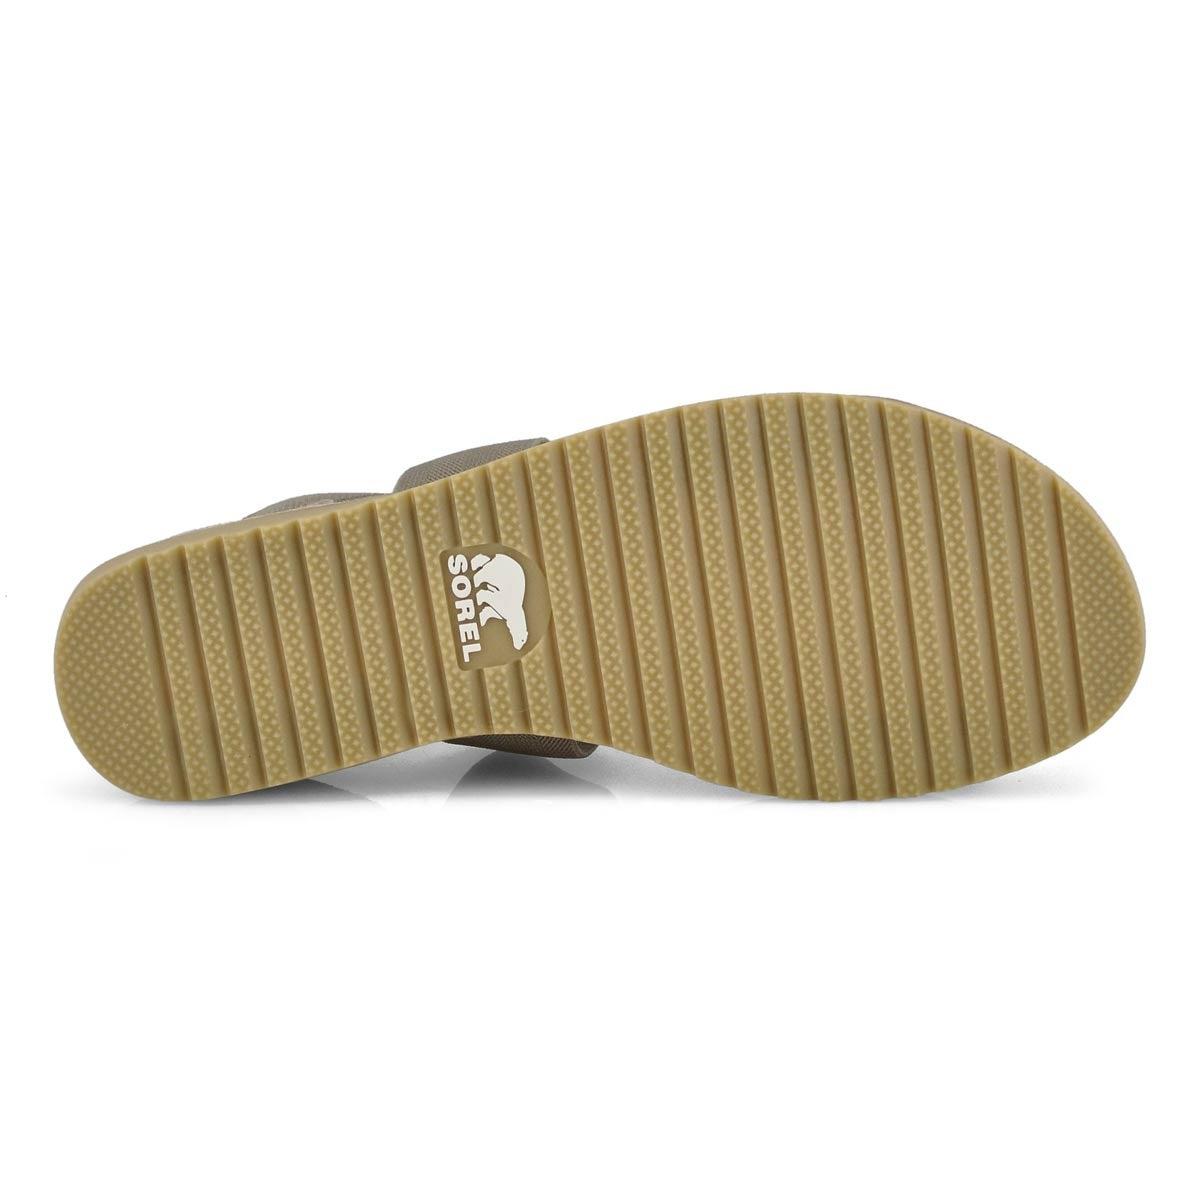 Lds Ella ash brown casual sandal